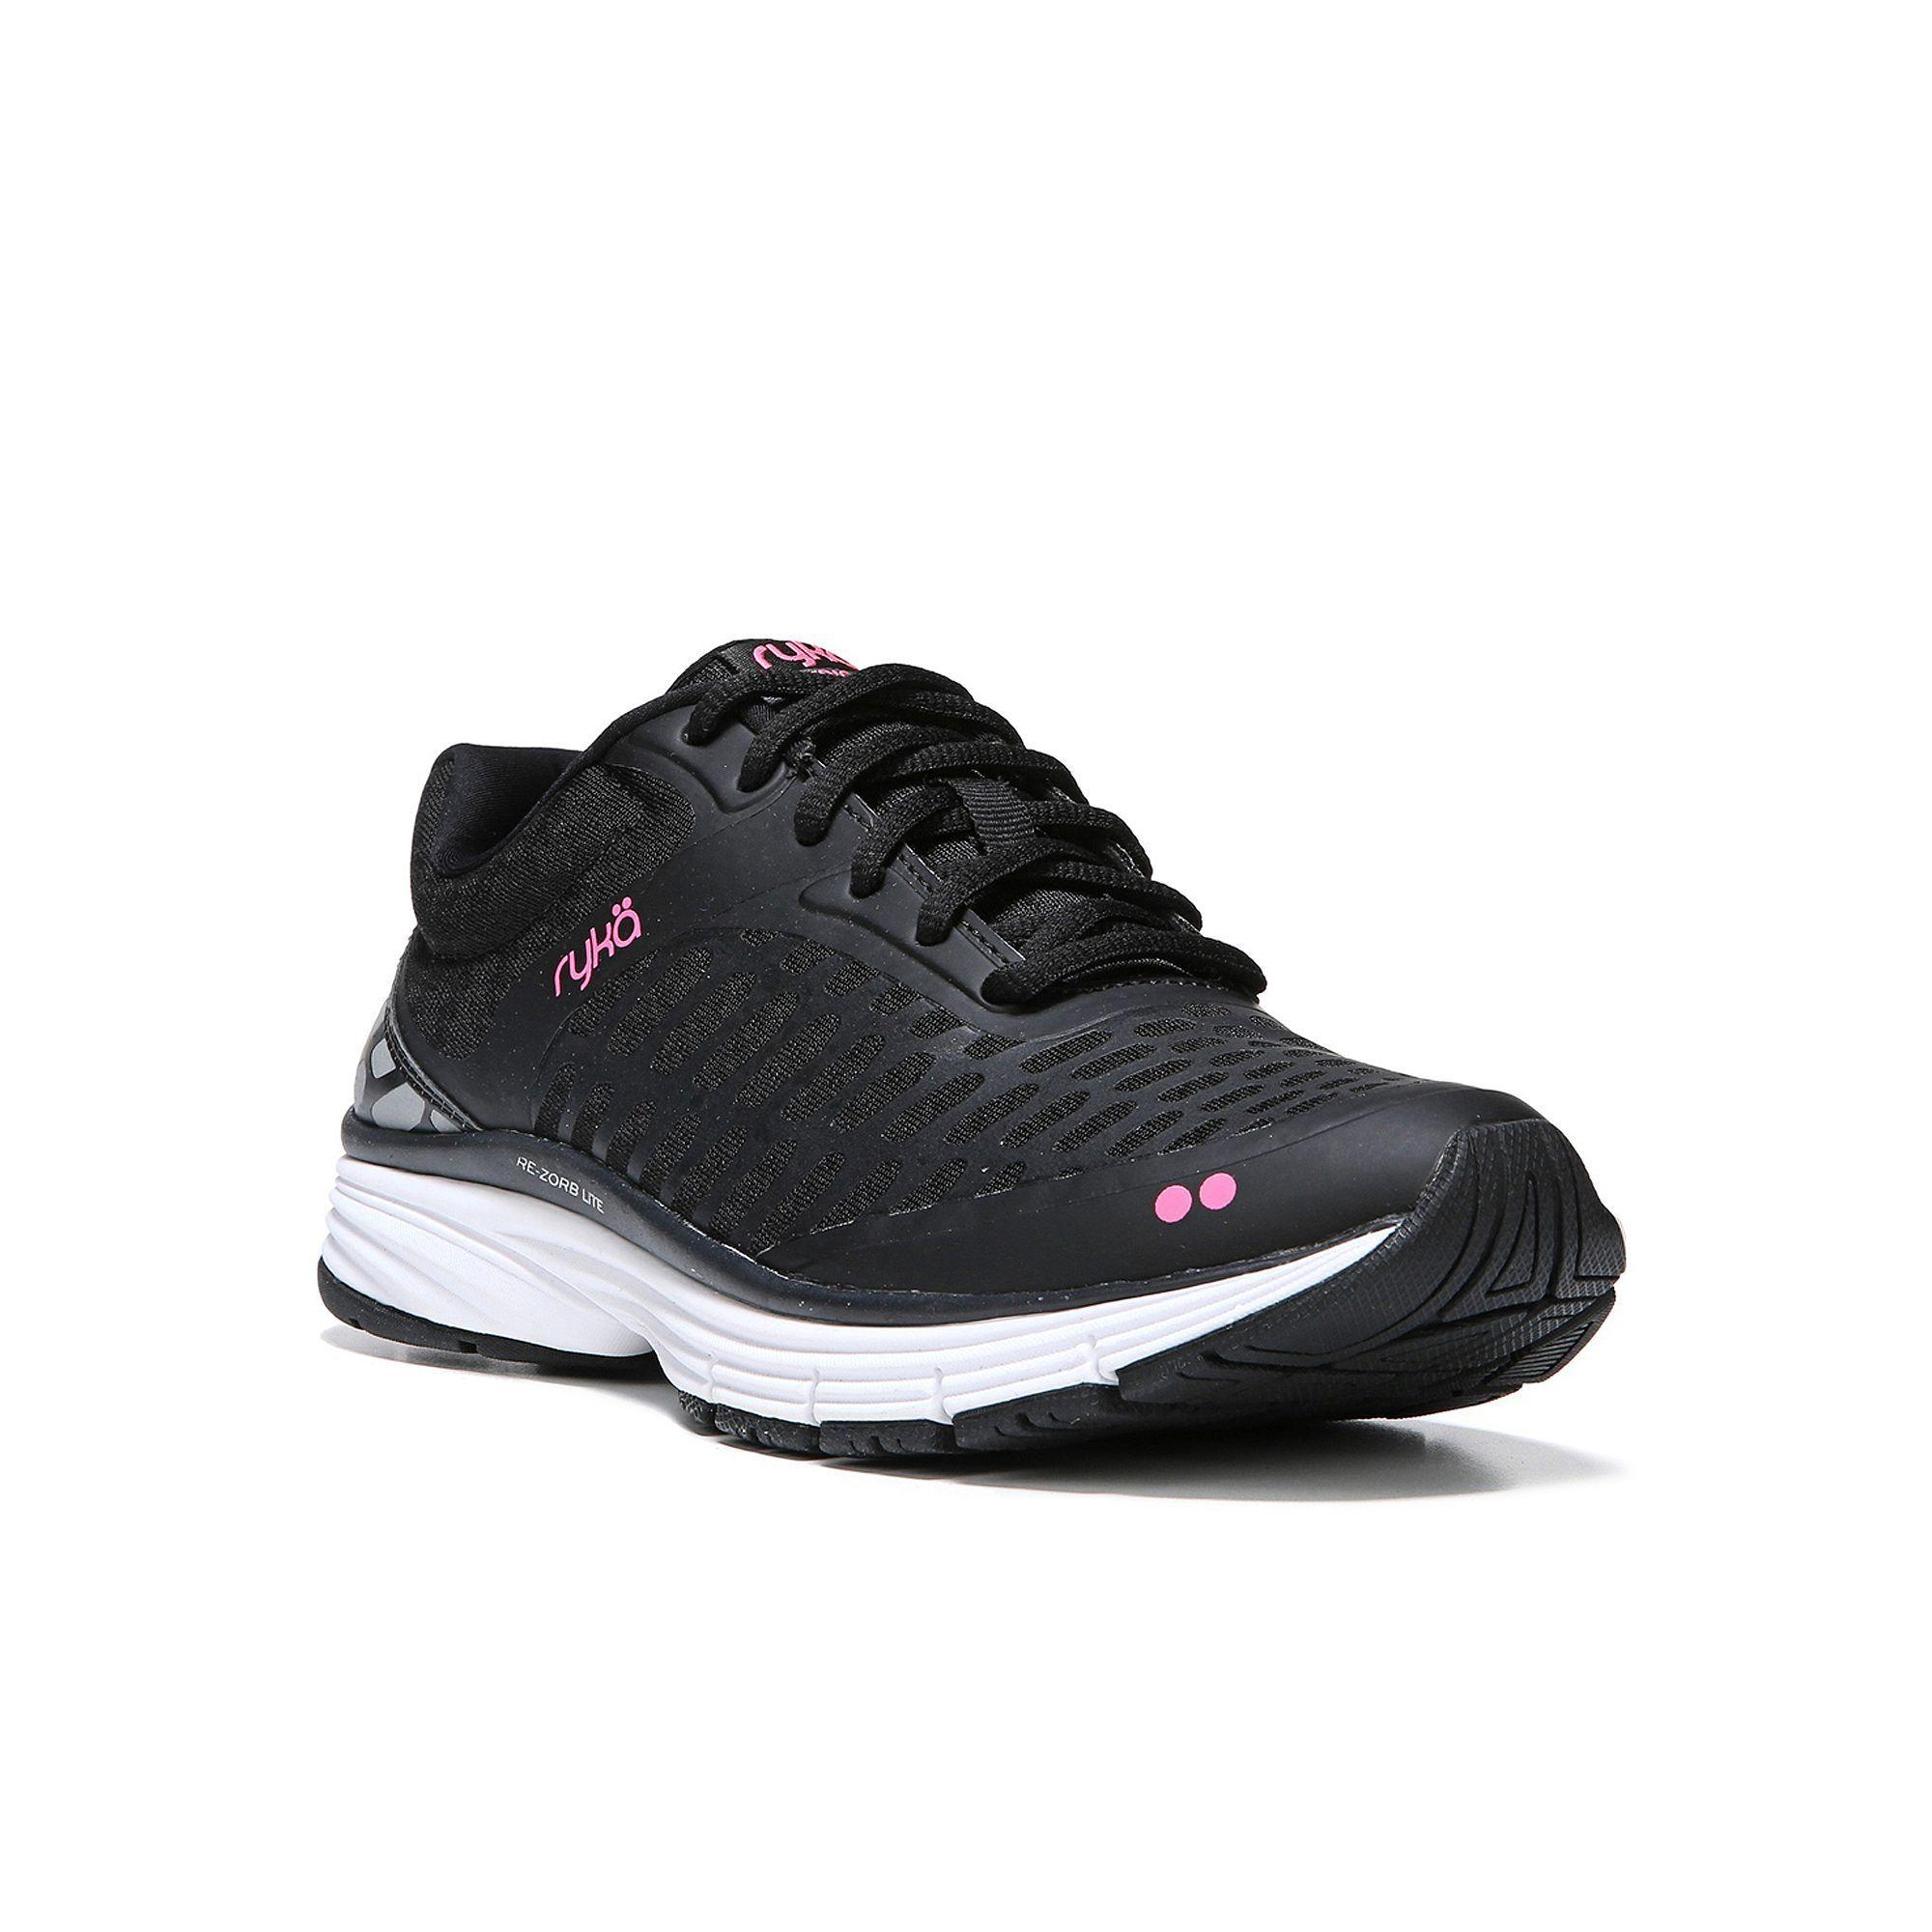 Ryka Indigo Women's Running Shoes, Size: medium (6.5), Dark Grey